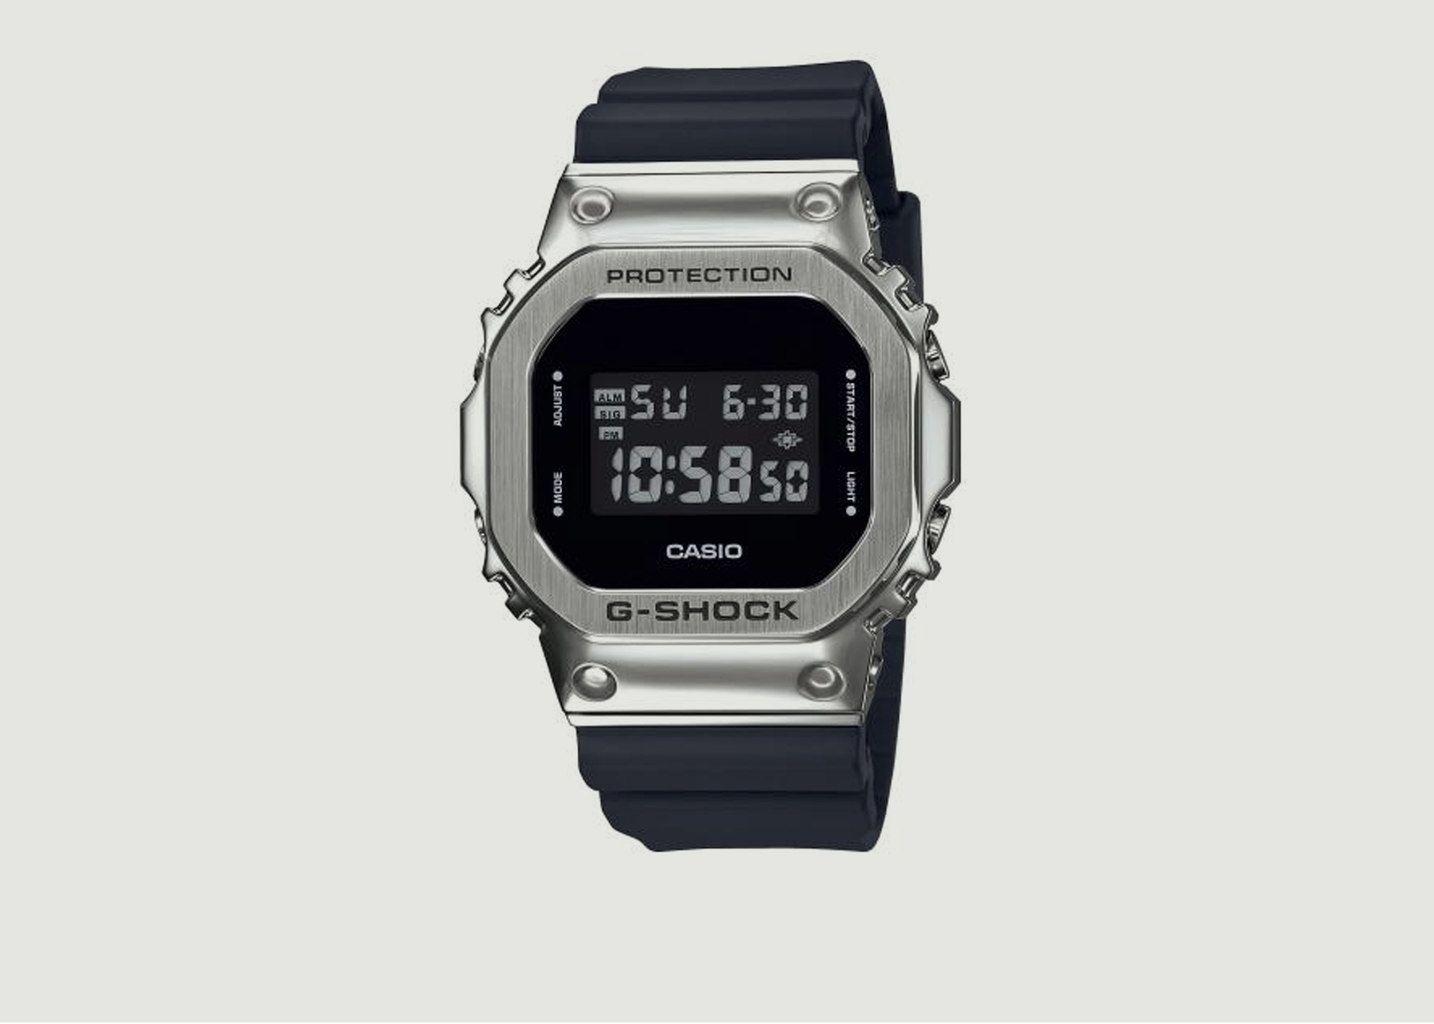 Montre G-SHOCK The Origin GM-5600 - Casio G-SHOCK